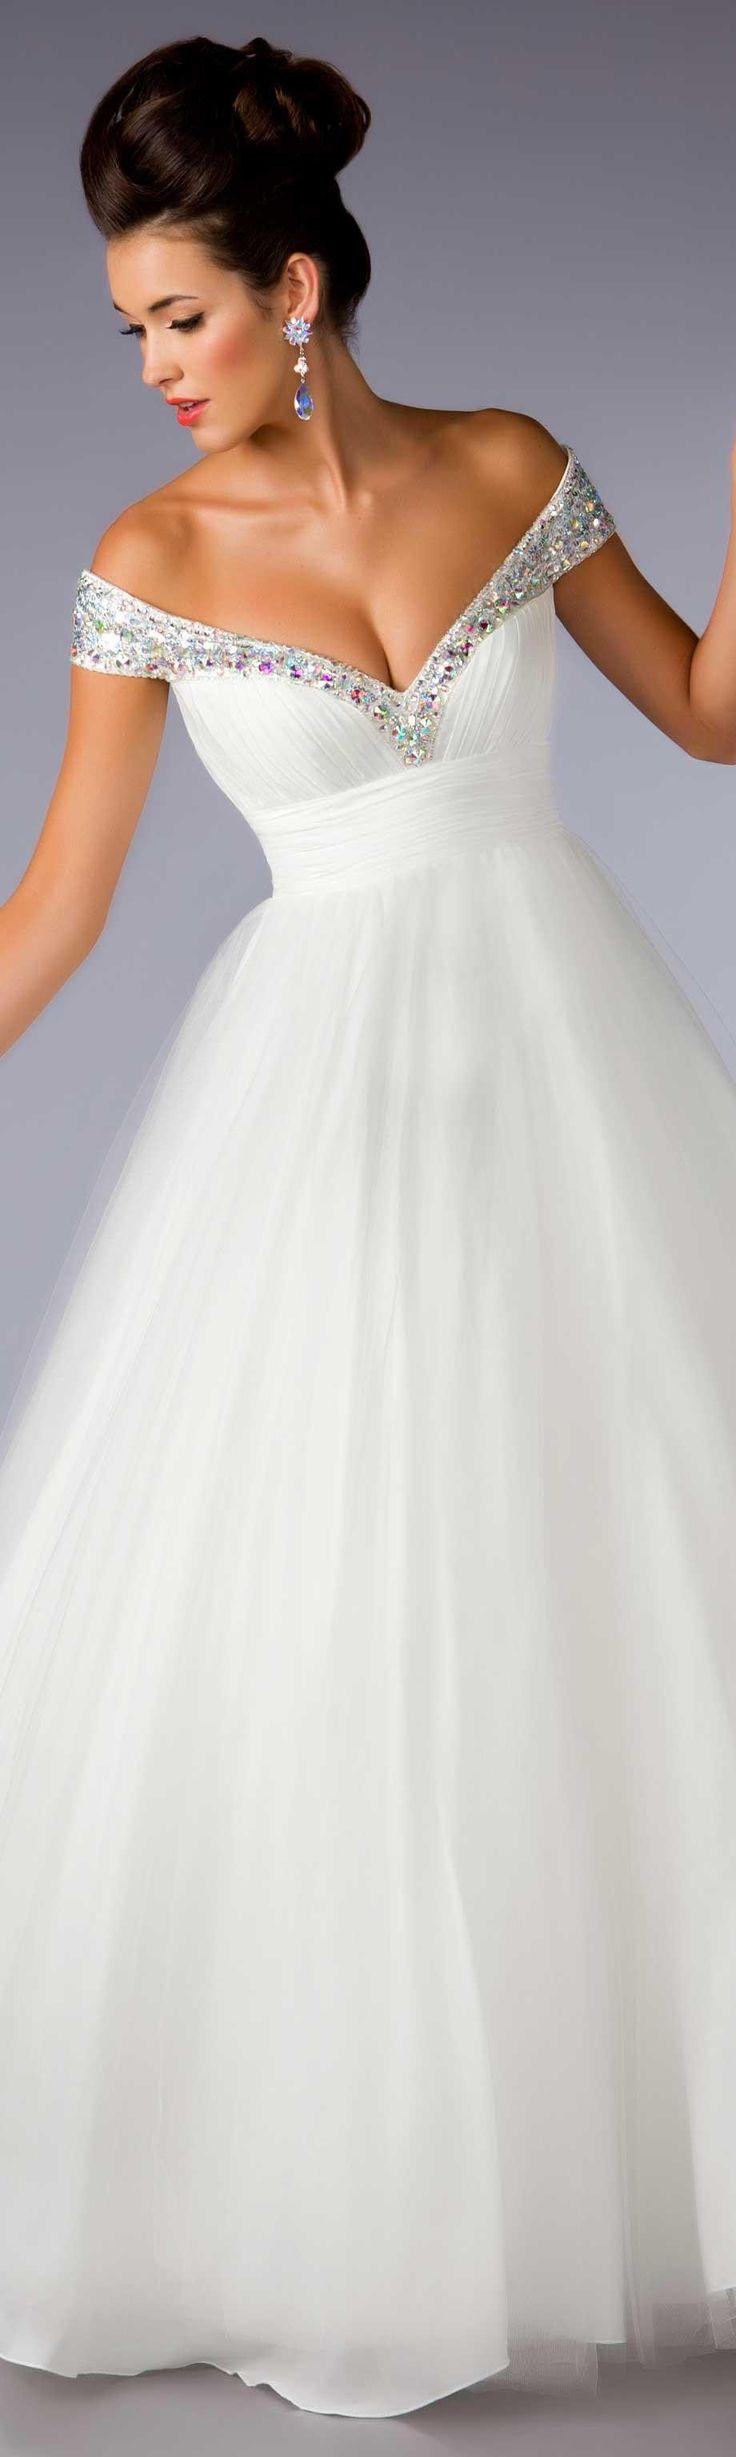 www.macduggal.com, Mac Duggal Couture, Bridal Collection, bride, bridal, wedding, noiva, عروس, زفاف, novia, sposa, כלה, abiti da sposa, vestidos de novia, vestidos de noiva, boda, casemento, mariage, matrimonio, wedding dress, wedding gown